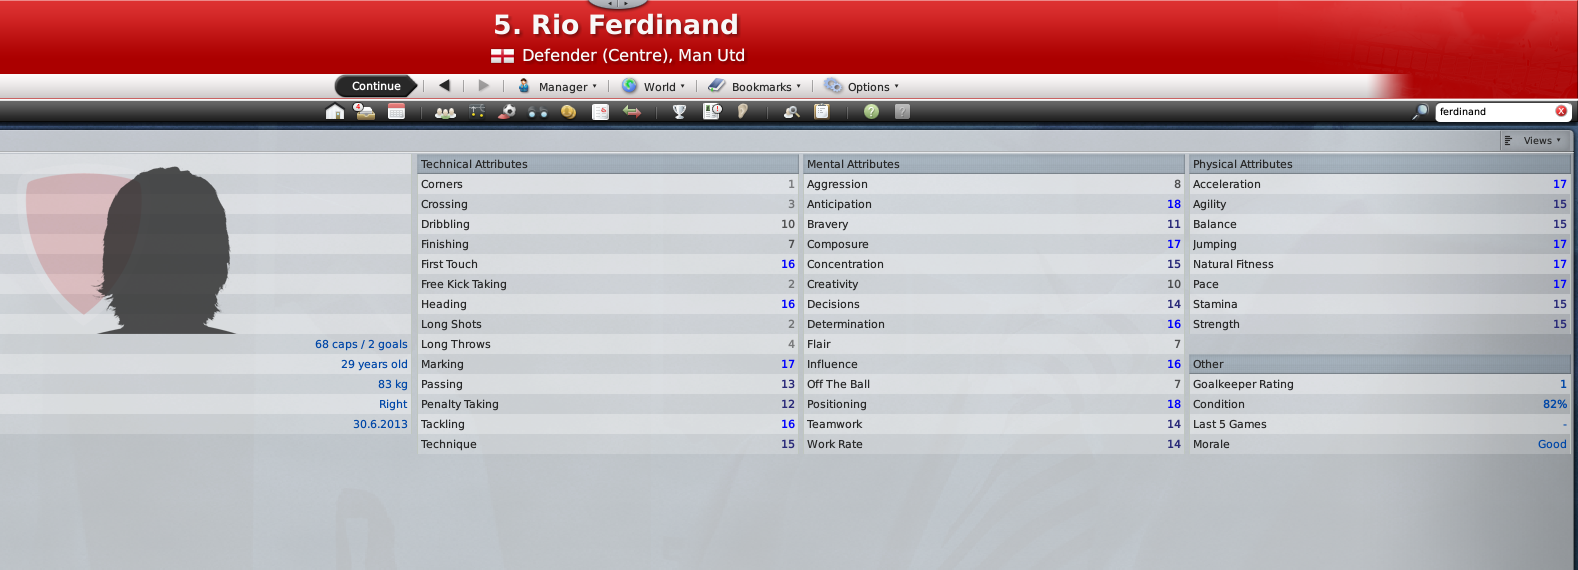 Ferdinand's FM09 Profile